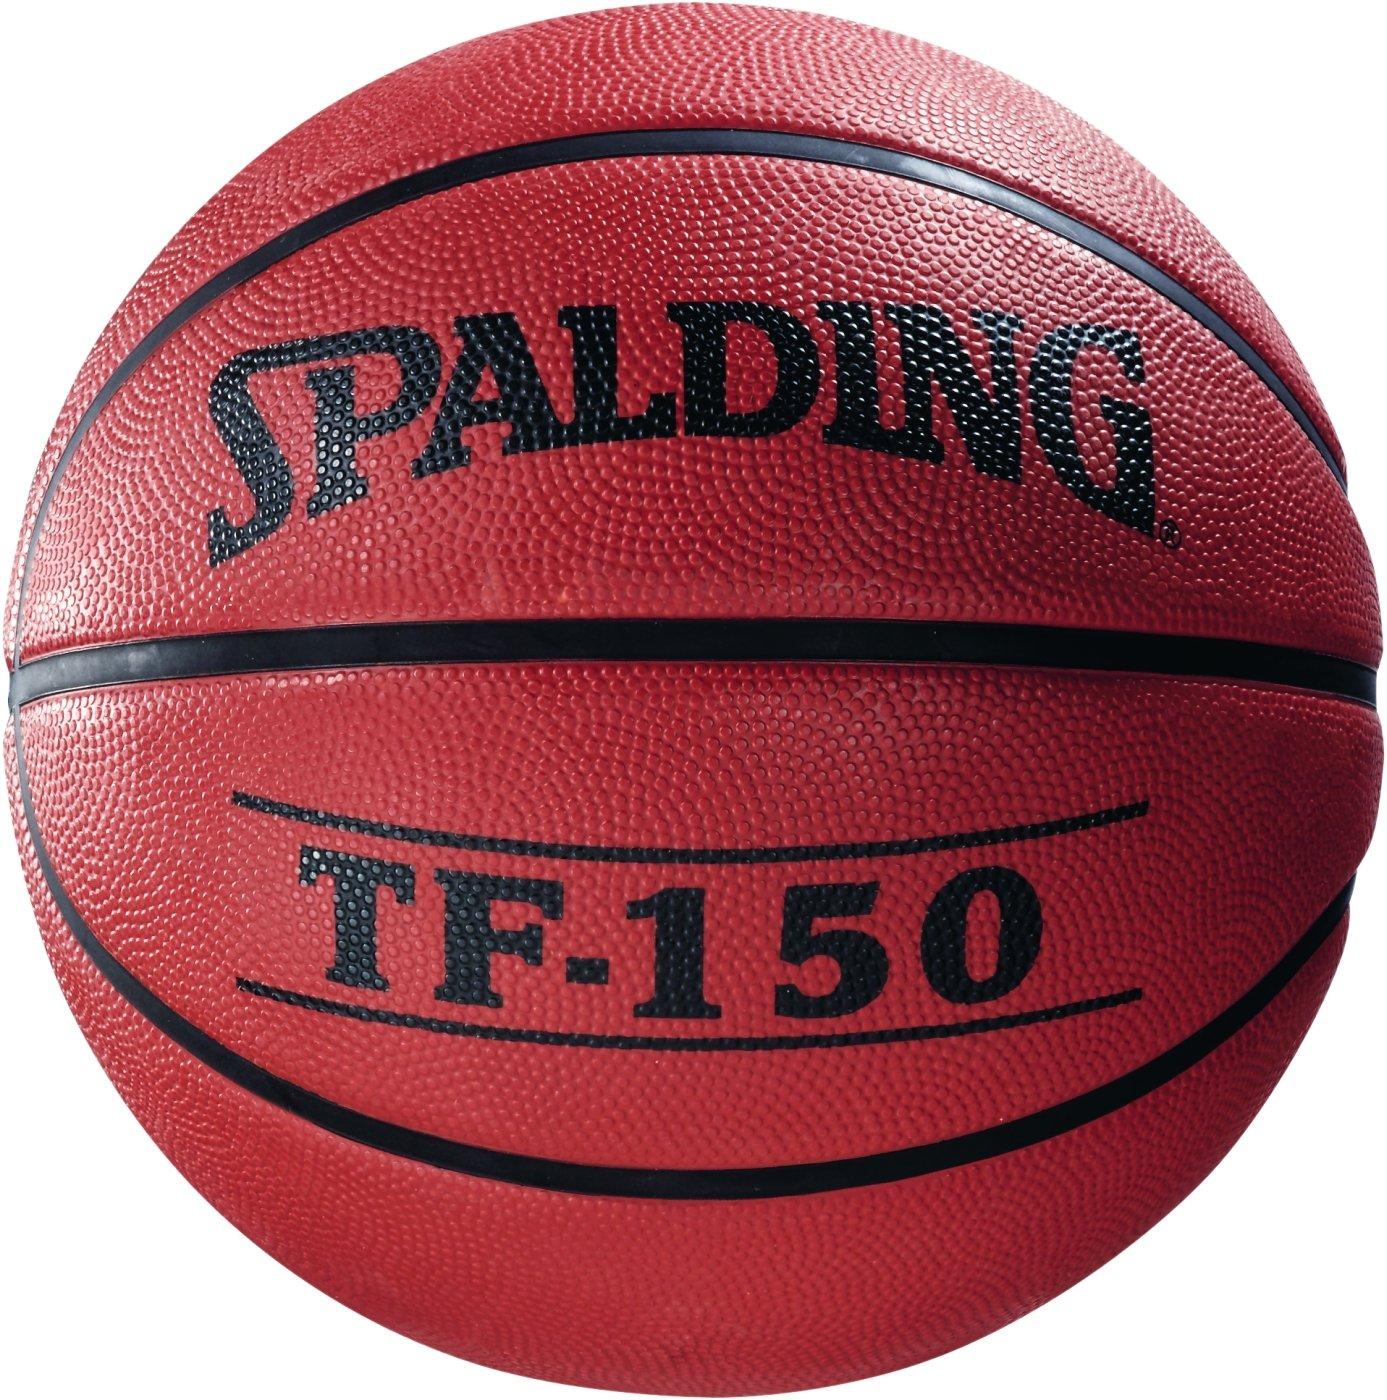 Spalding TF 150 - Balón de Baloncesto Naranja Naranja Talla:7 ...